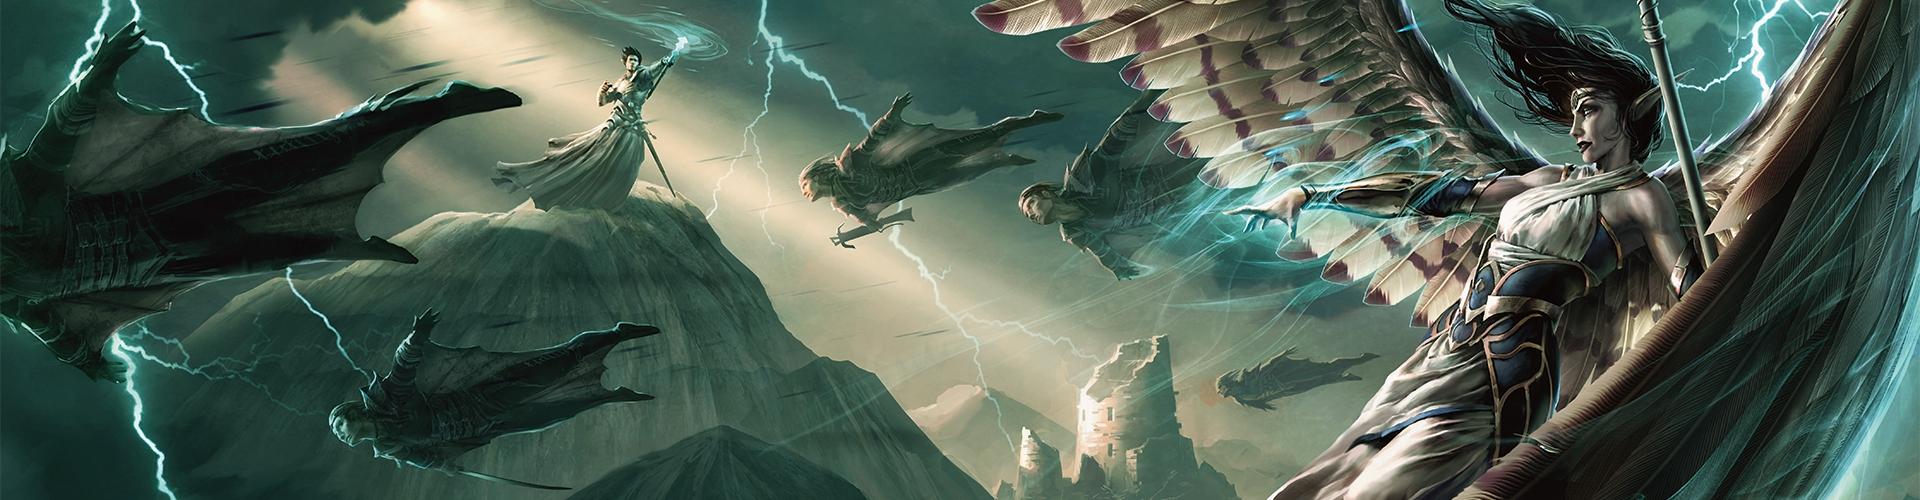 Neverwinter: Elemental Evil